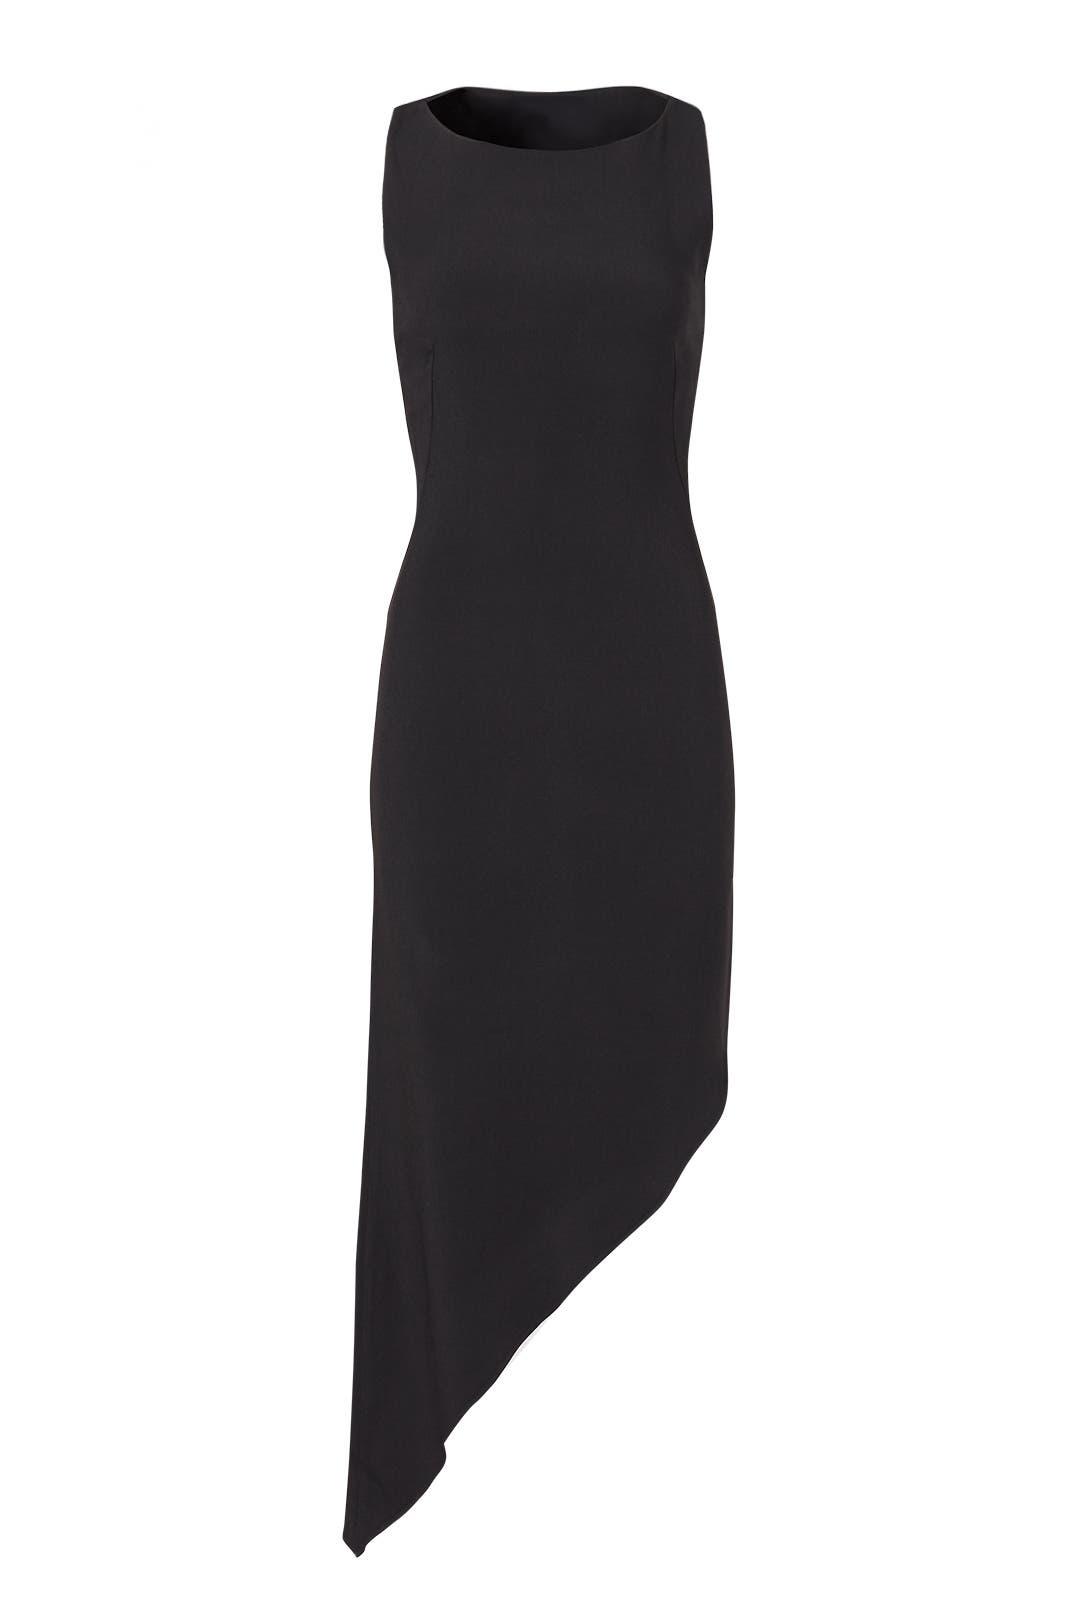 f8bc6be23a3 Black Zandra Slash Dress by Osman for  150